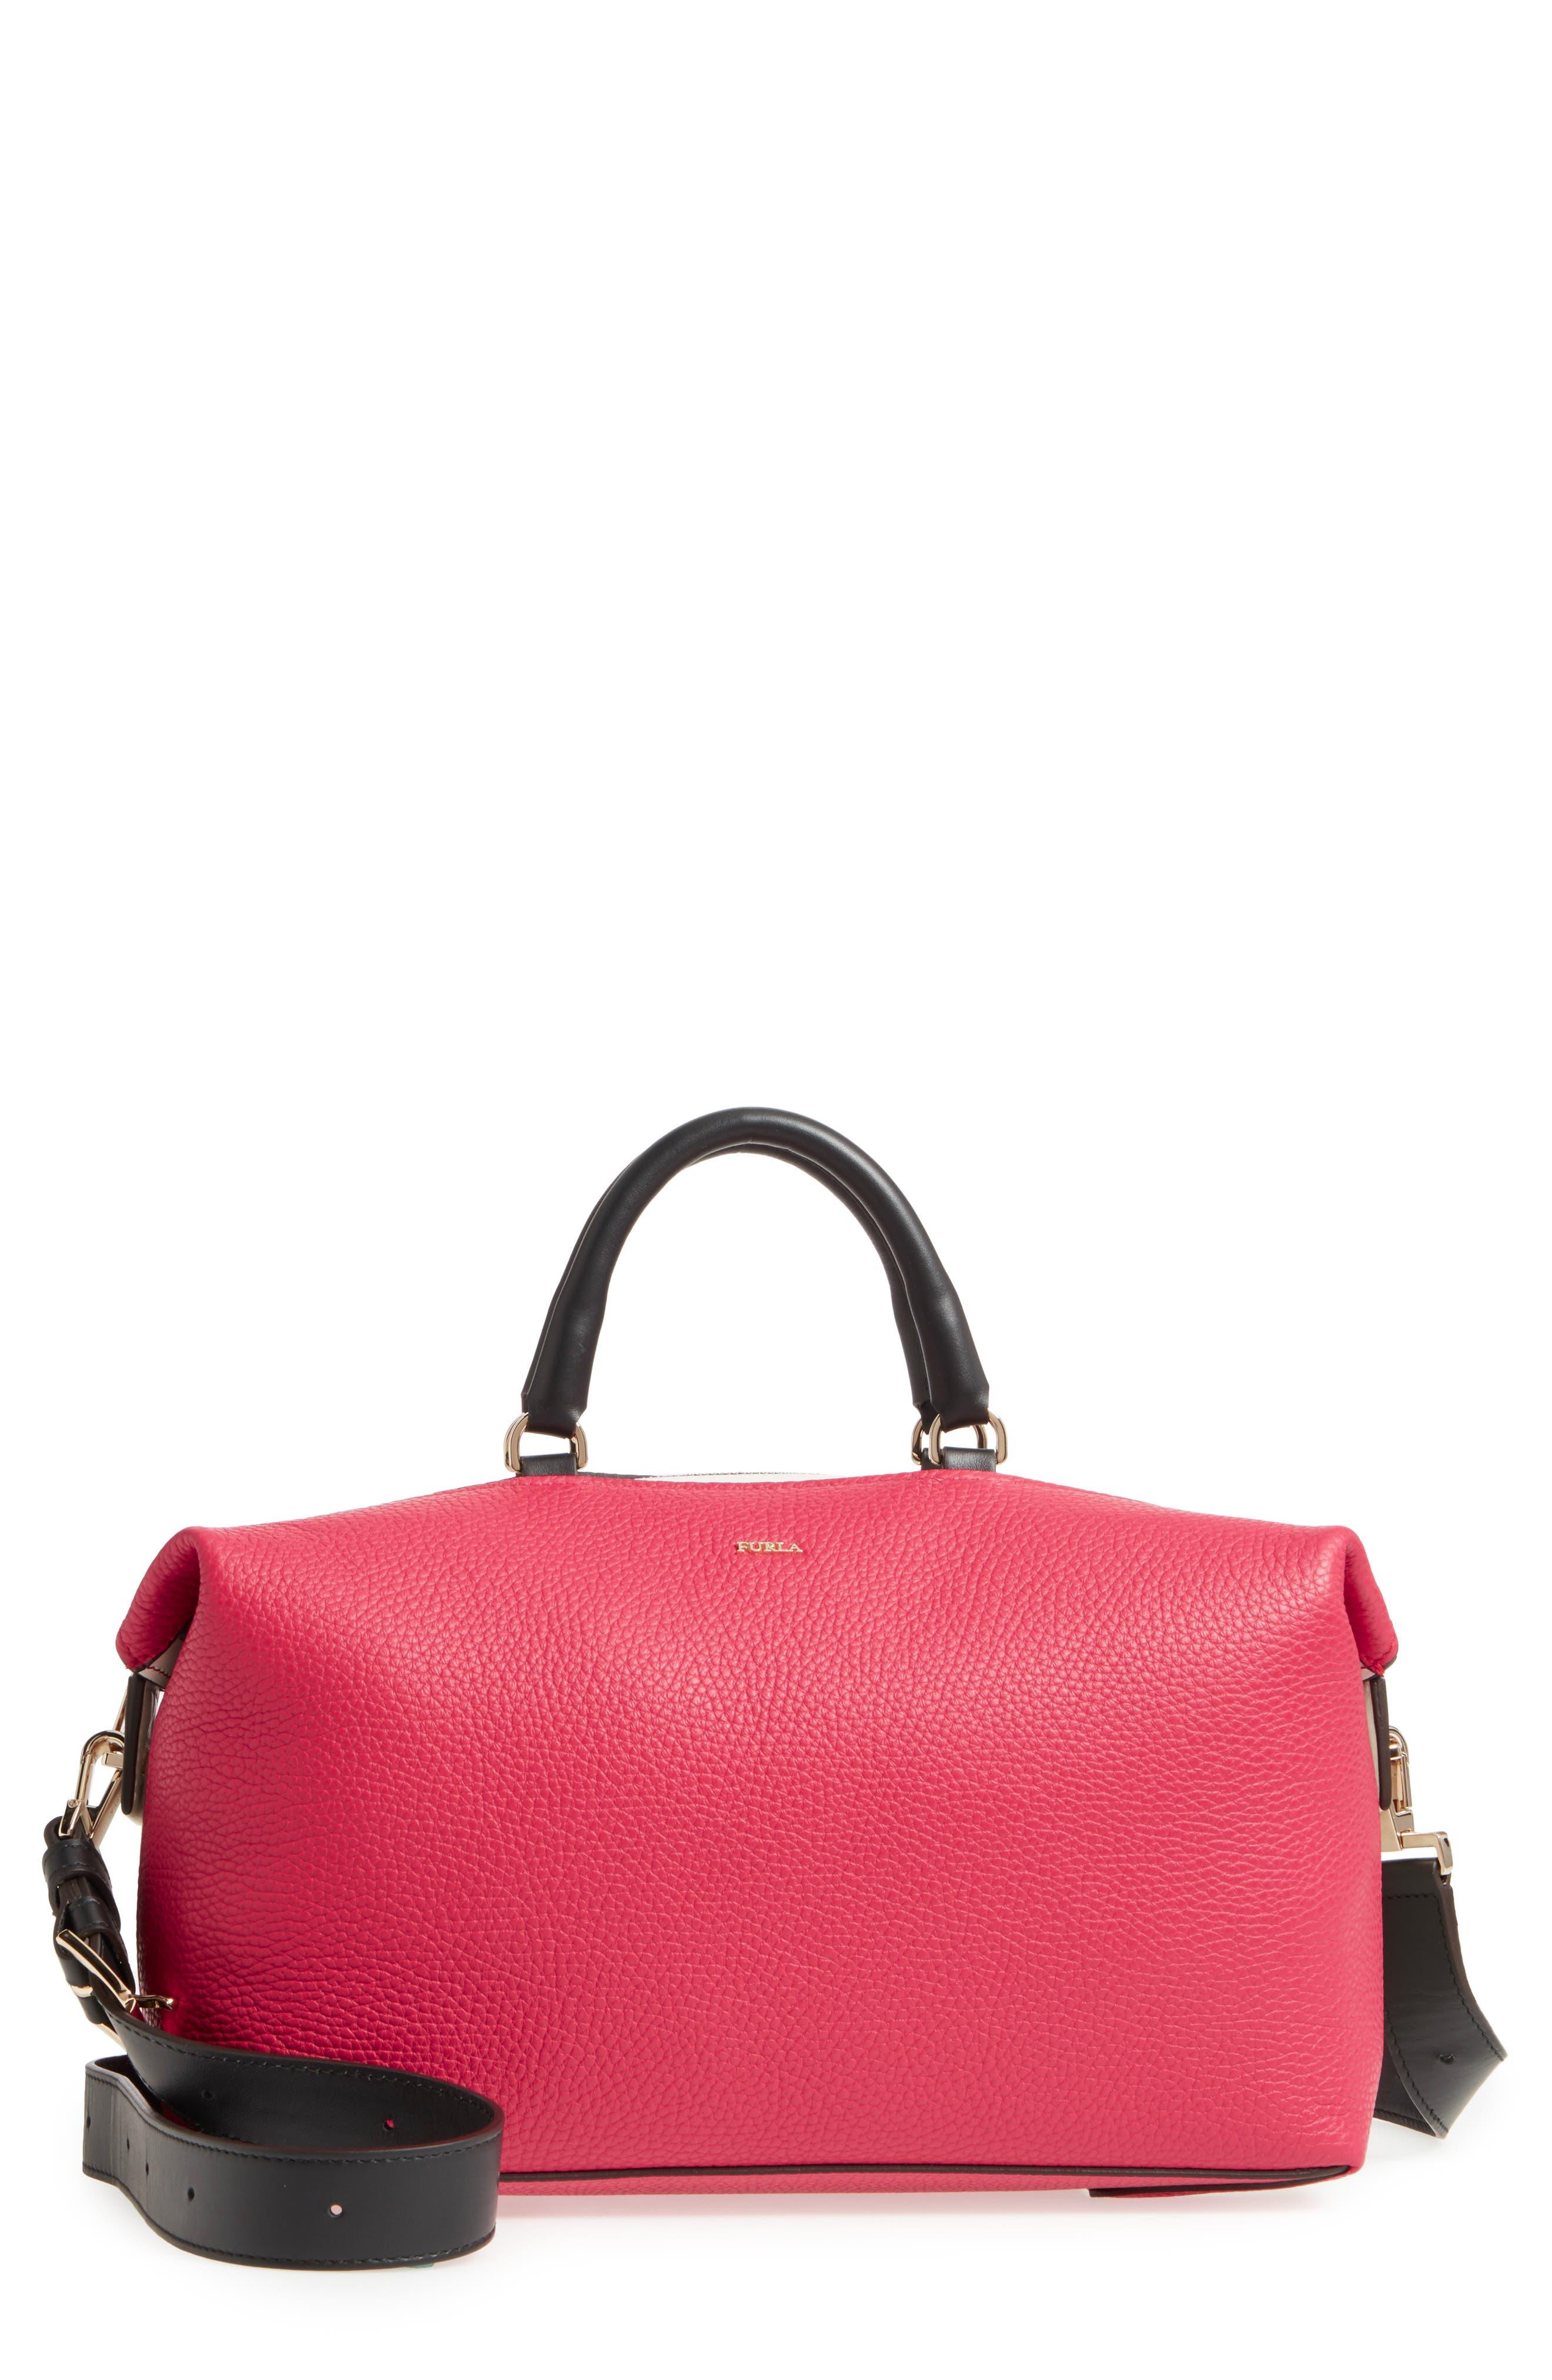 Alternate Image 1 Selected - Furla Blogger Colorblock Leather Satchel